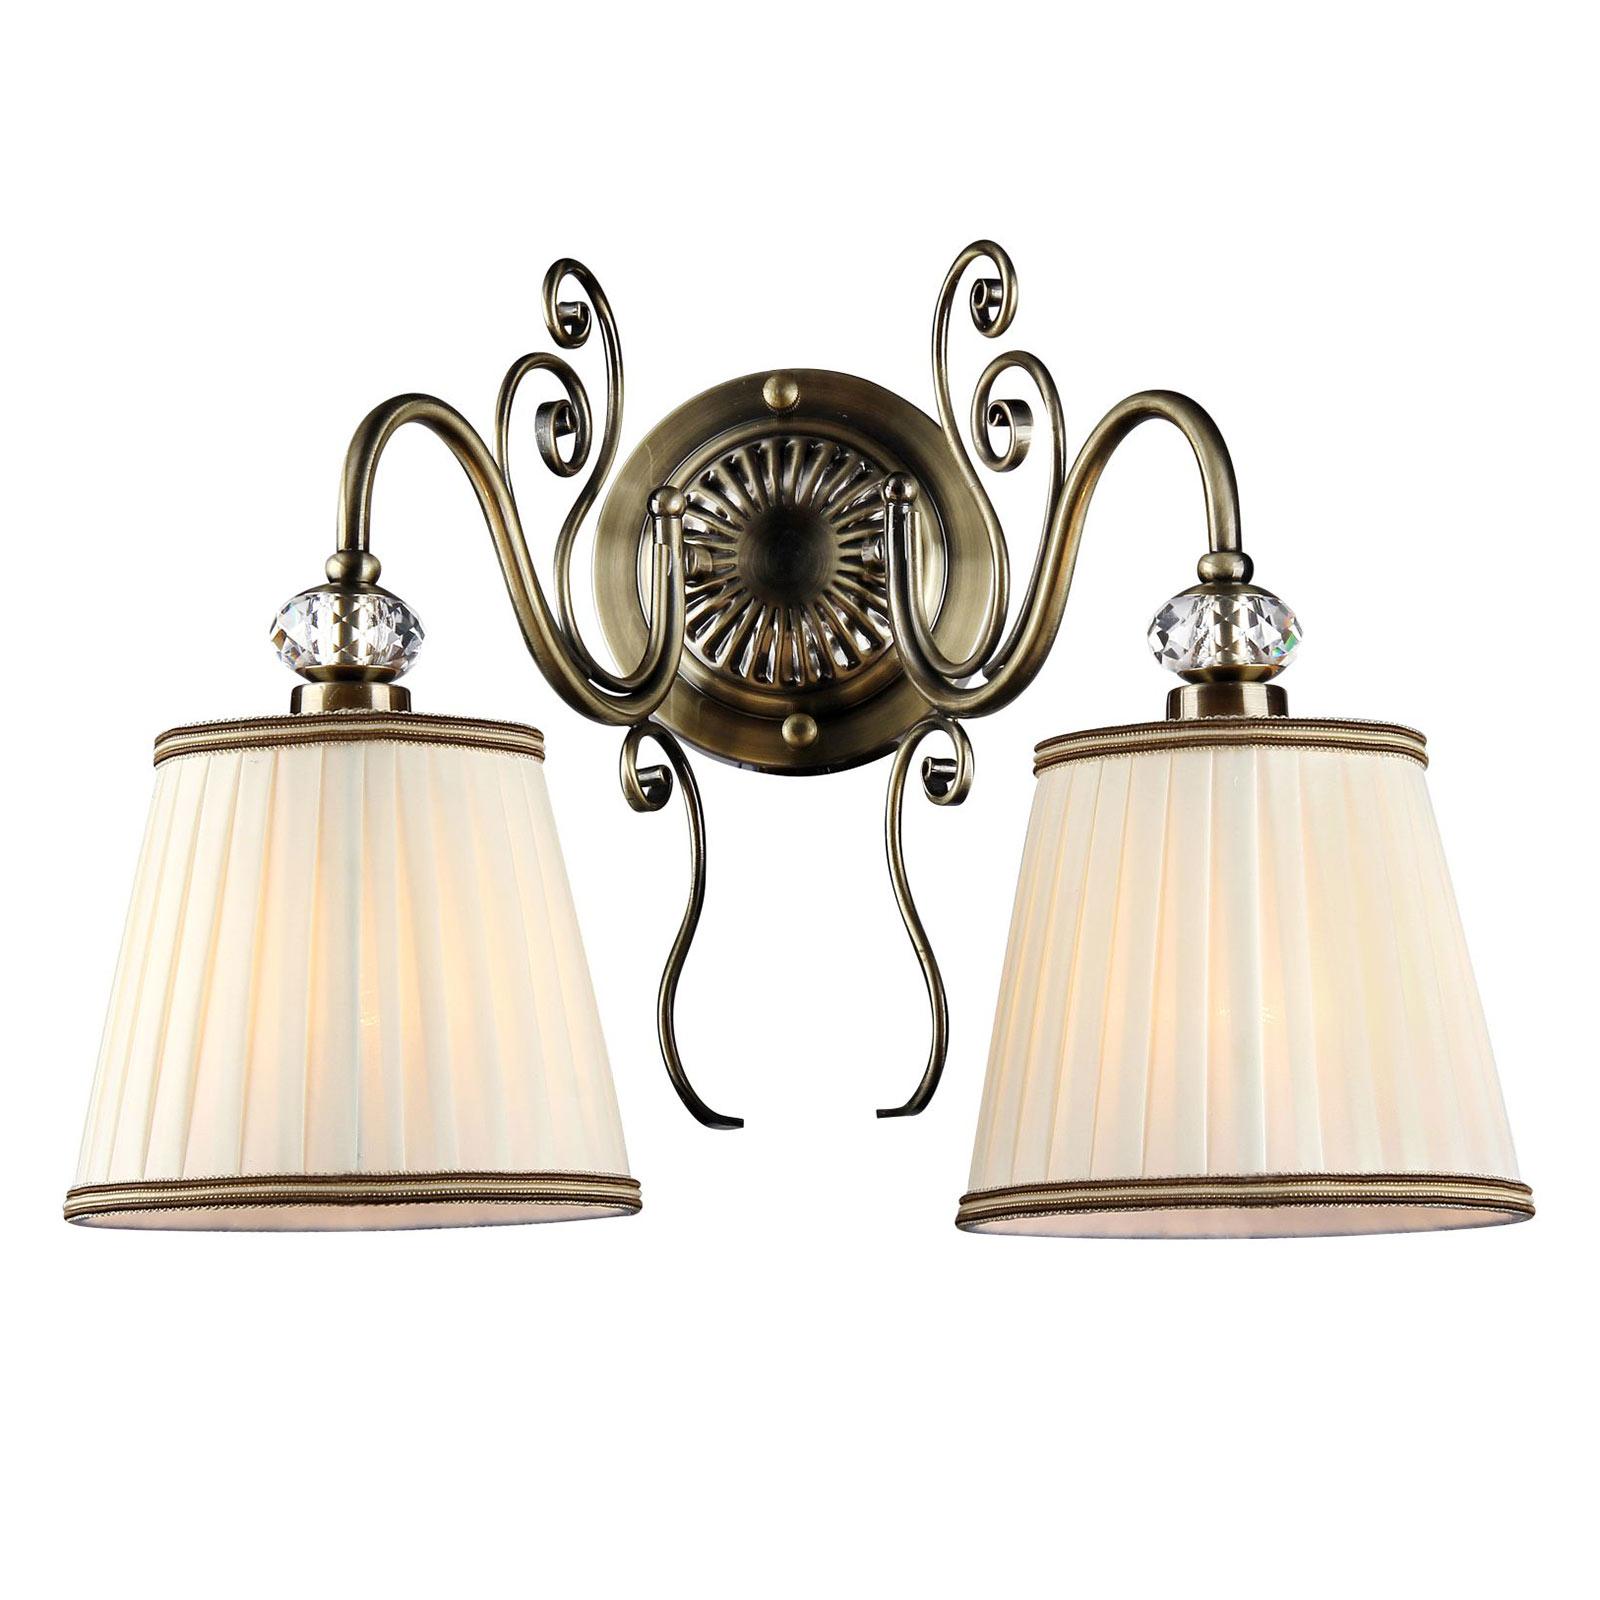 Wandlamp Vintage, 2-lamps